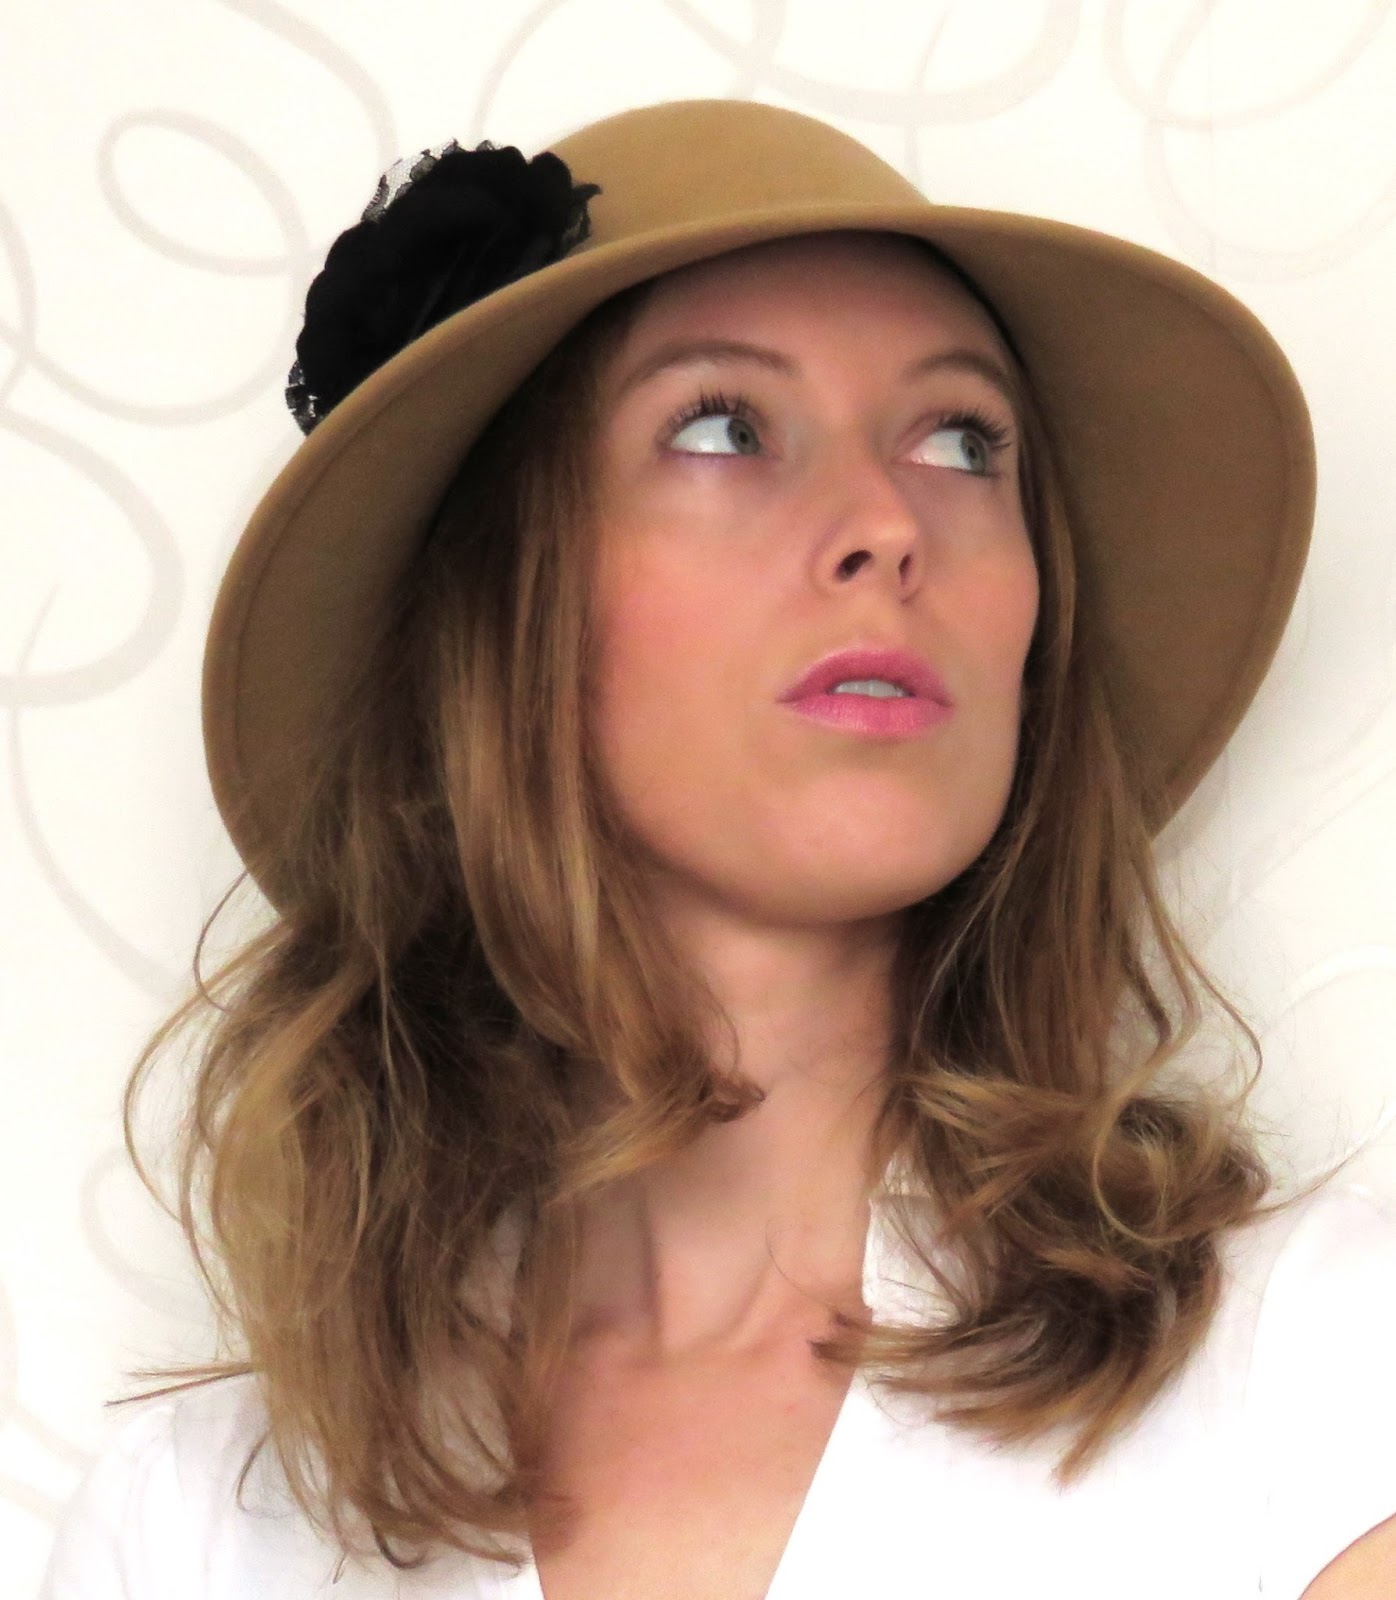 chic neutral hat with black flower chique neutrale hoed met zwarte bloem